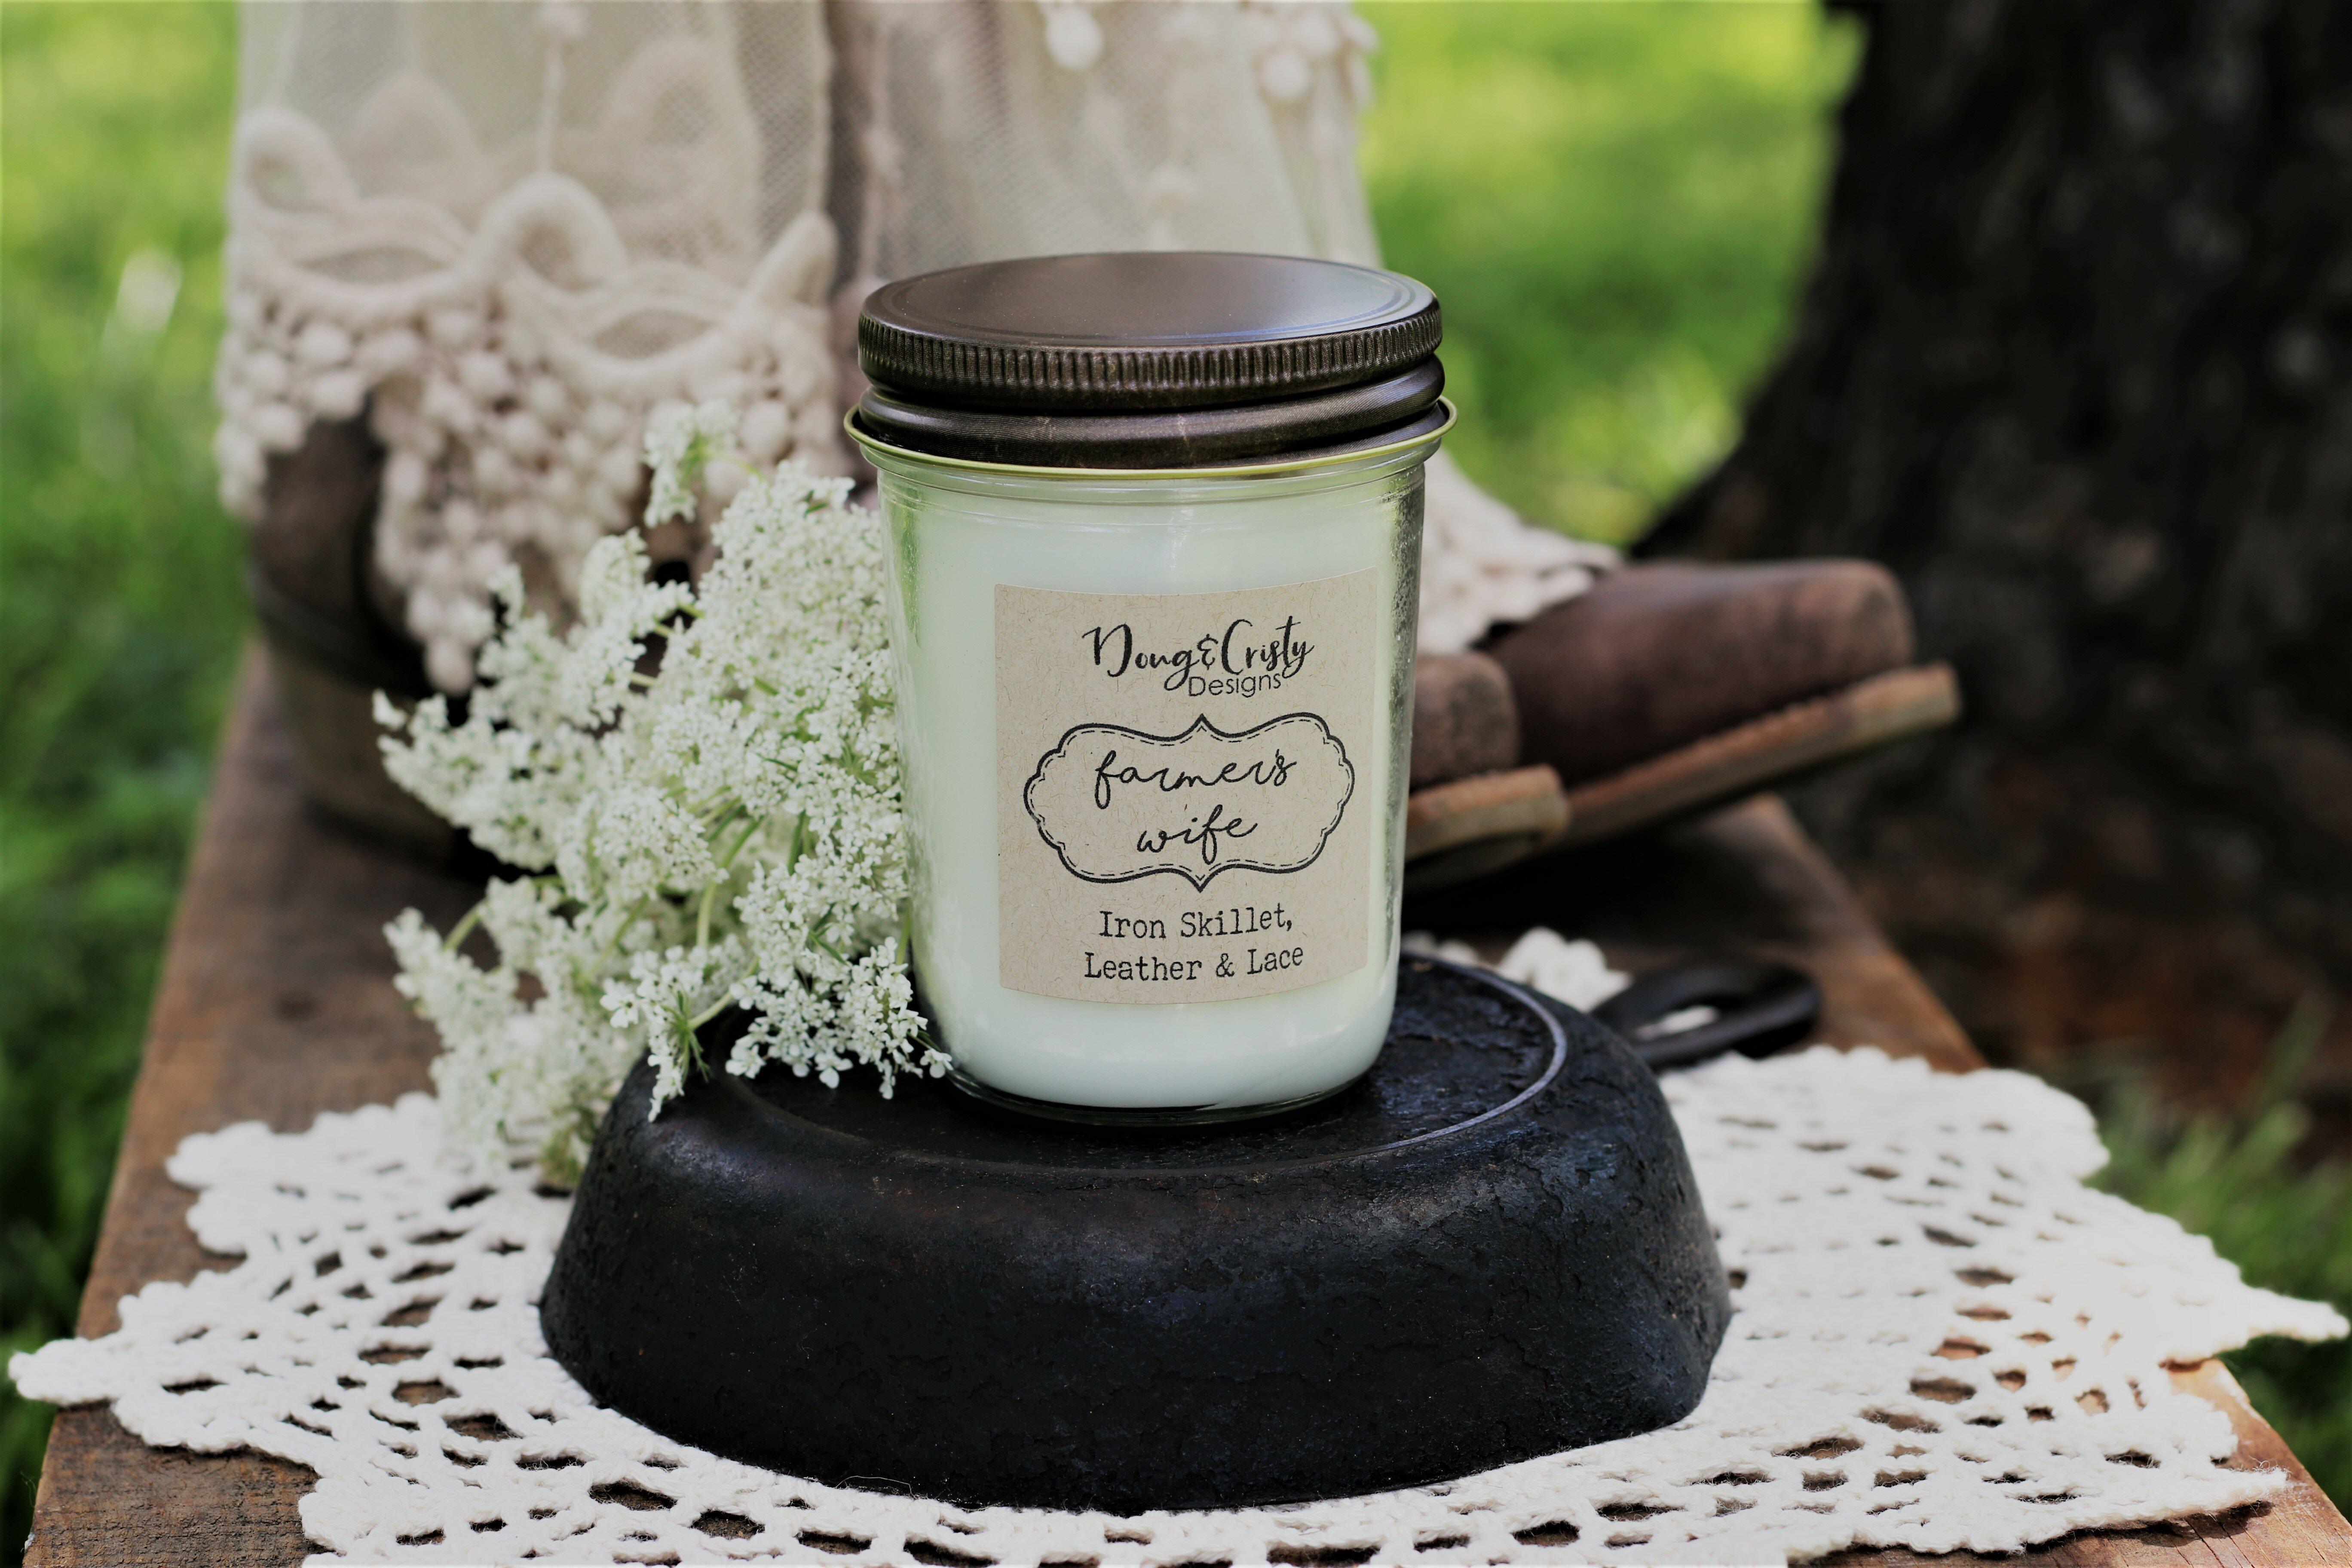 Dougandcristydesigns Farmers Wife Scented Jar Candle Wayfair